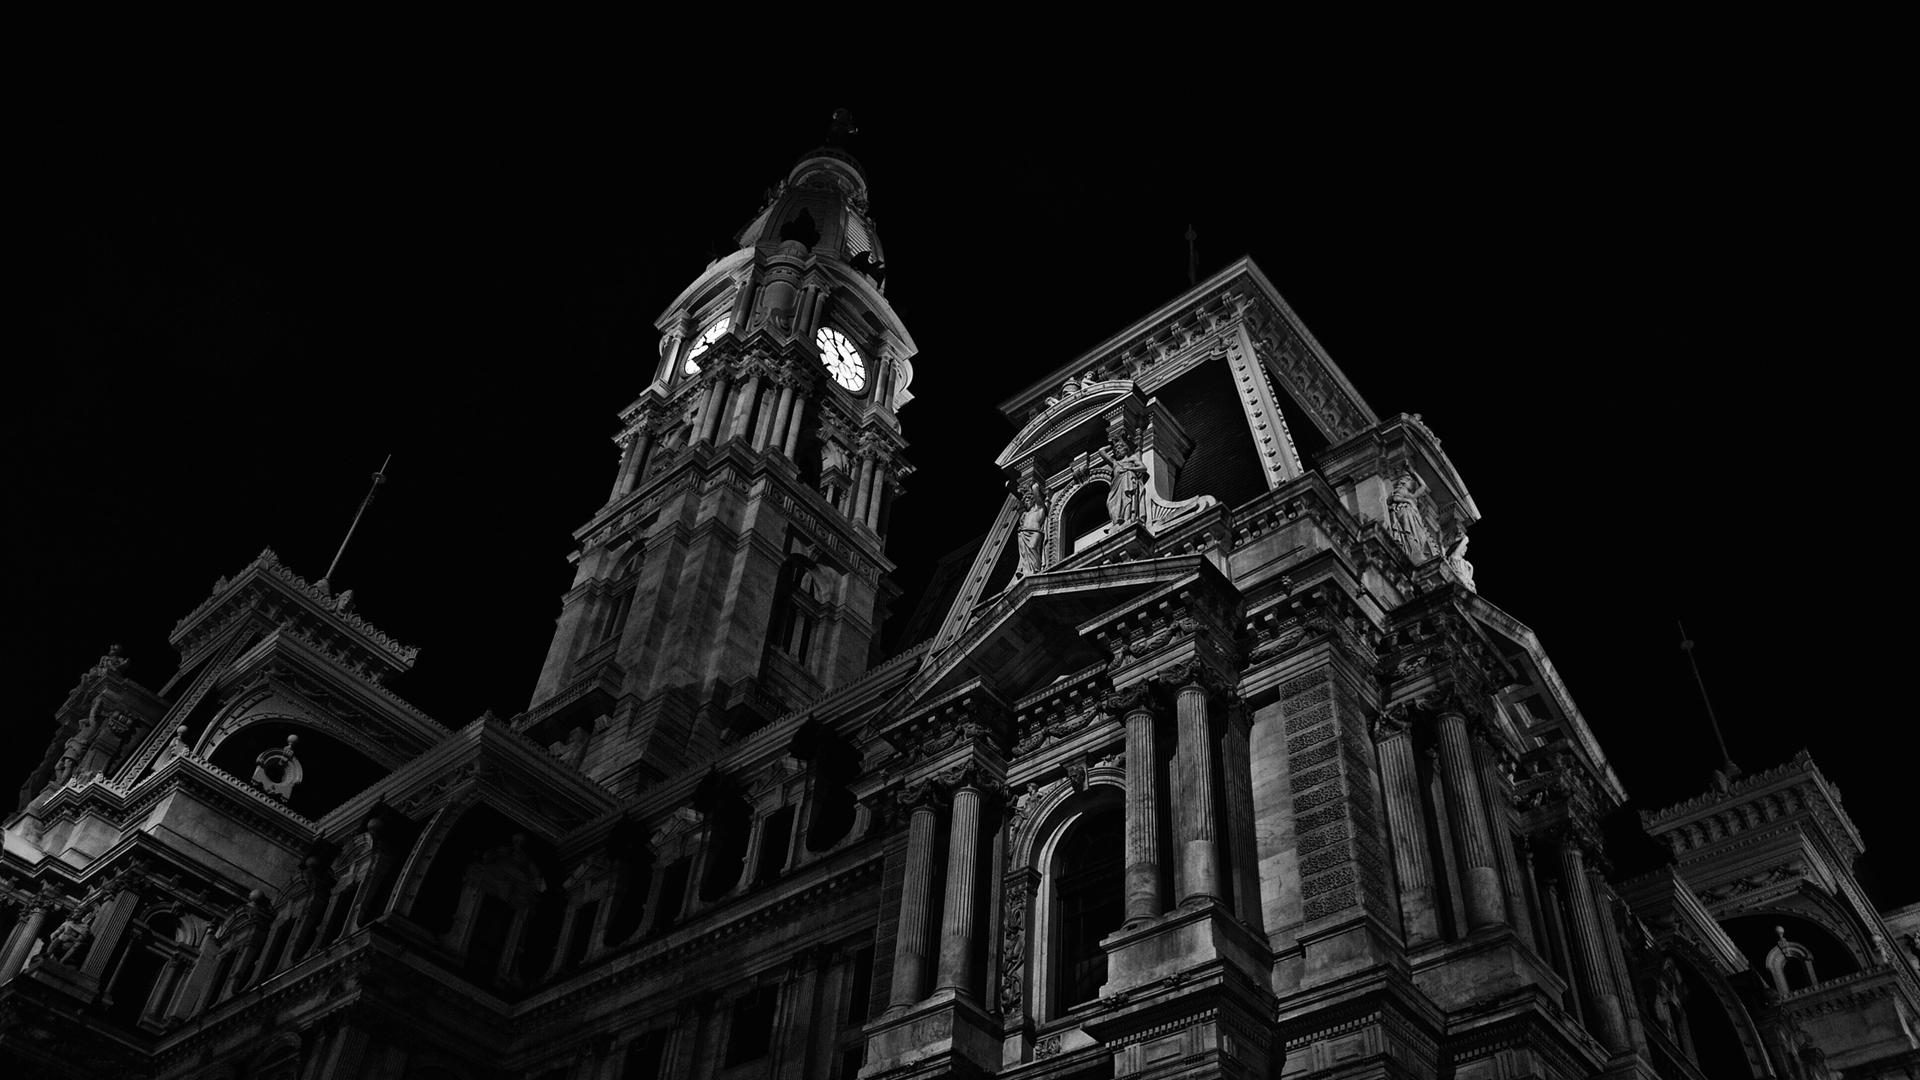 Best Wallpaper Night Dark - building_skyscraper_black_white_night_dark_679_1920x1080  Image.jpg